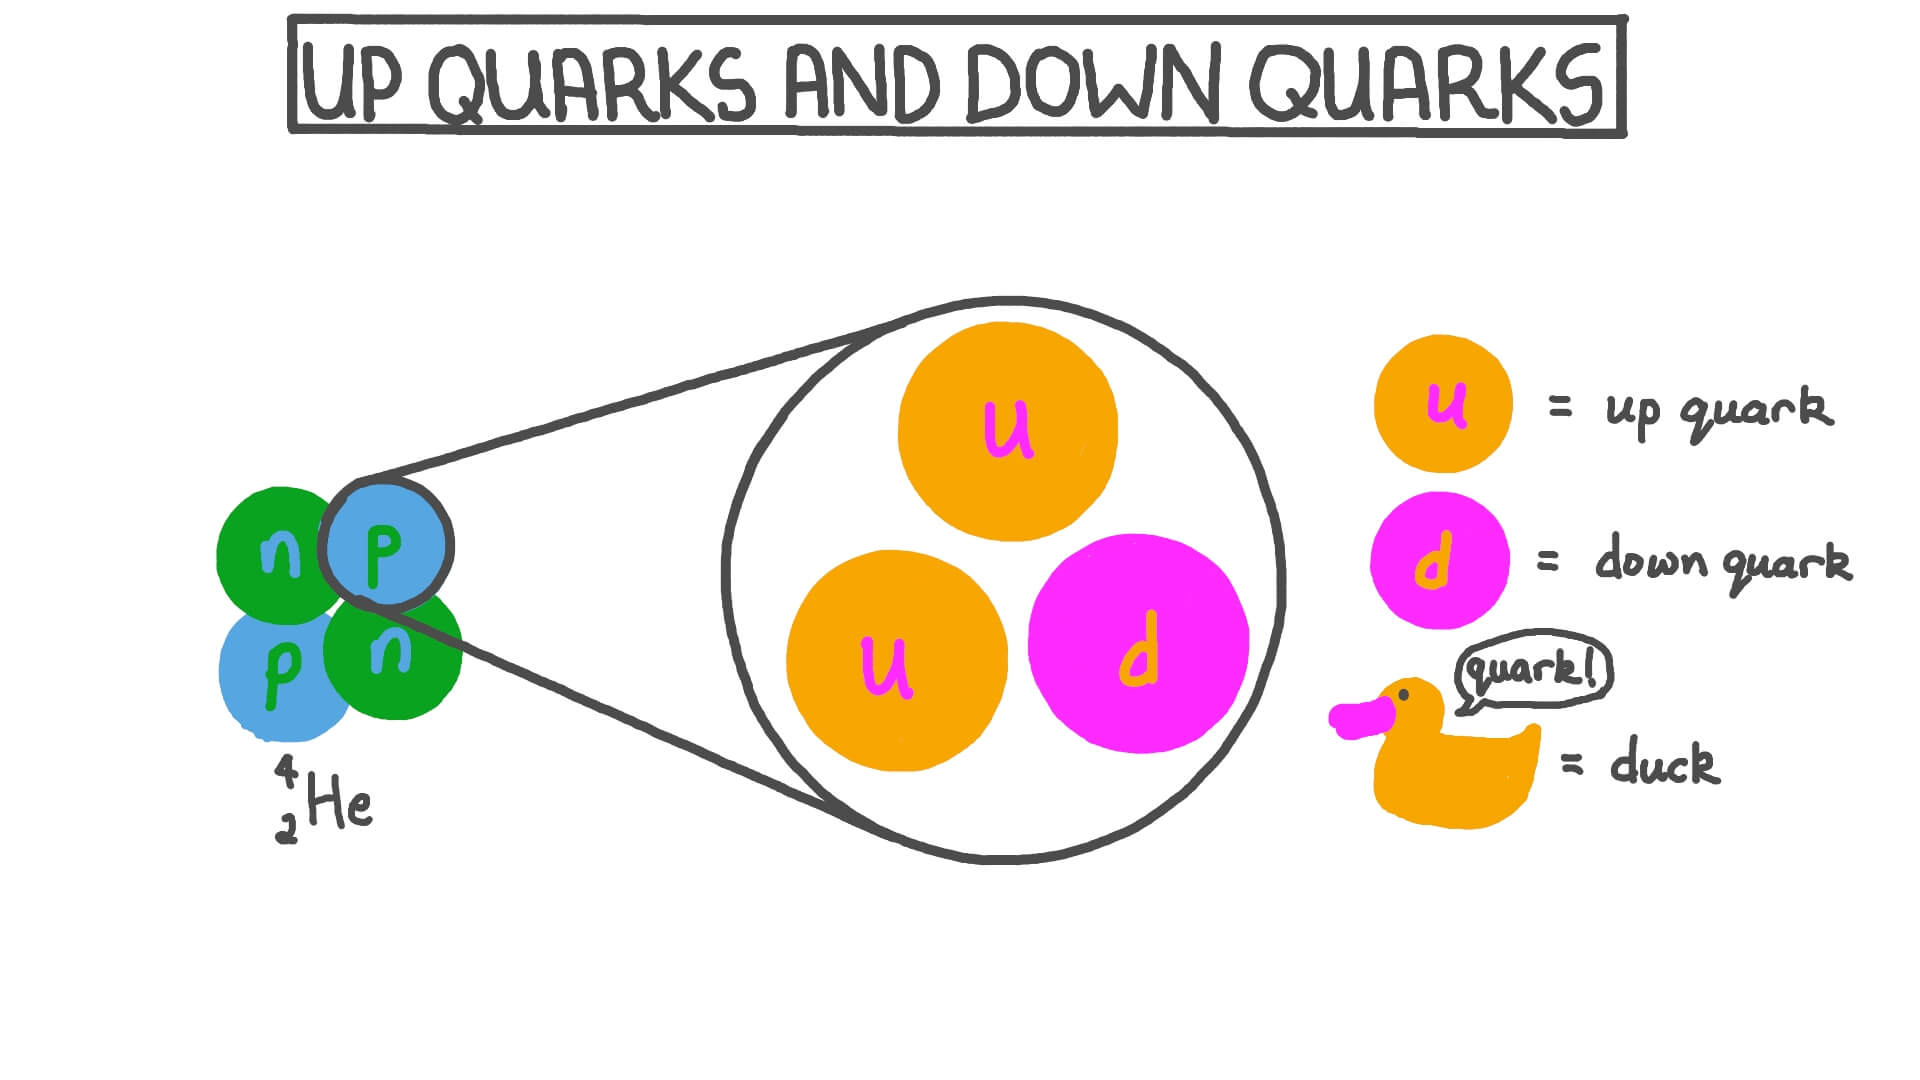 Quaks